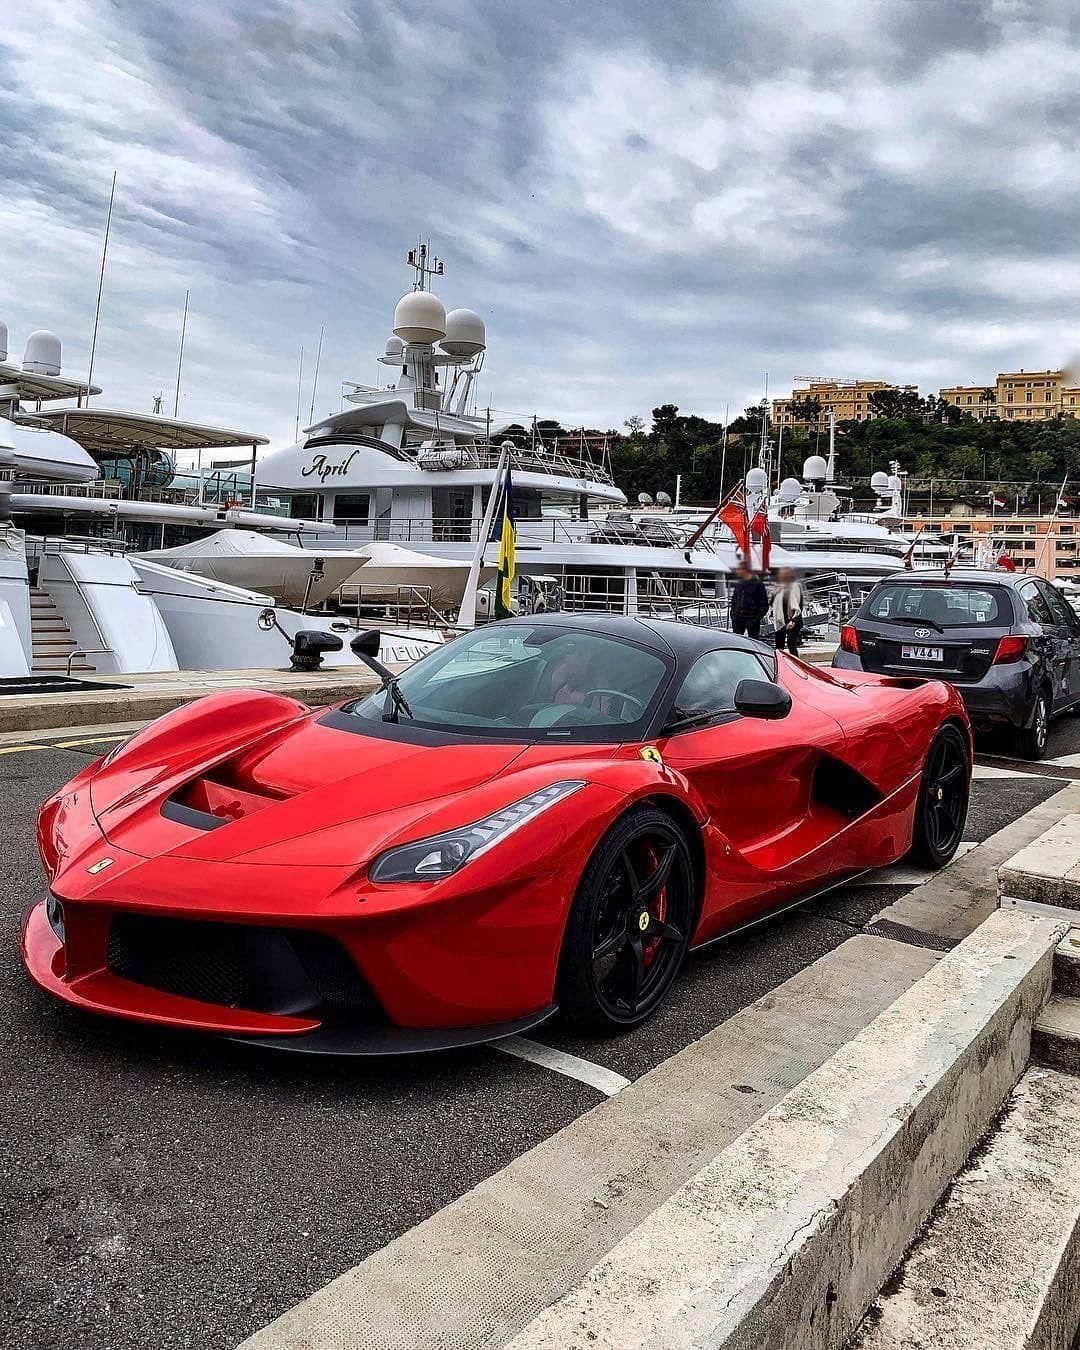 Ferrari Fan Page on Instagram: #rariforce Ferrari Laferrari. Thoughts? Pic by